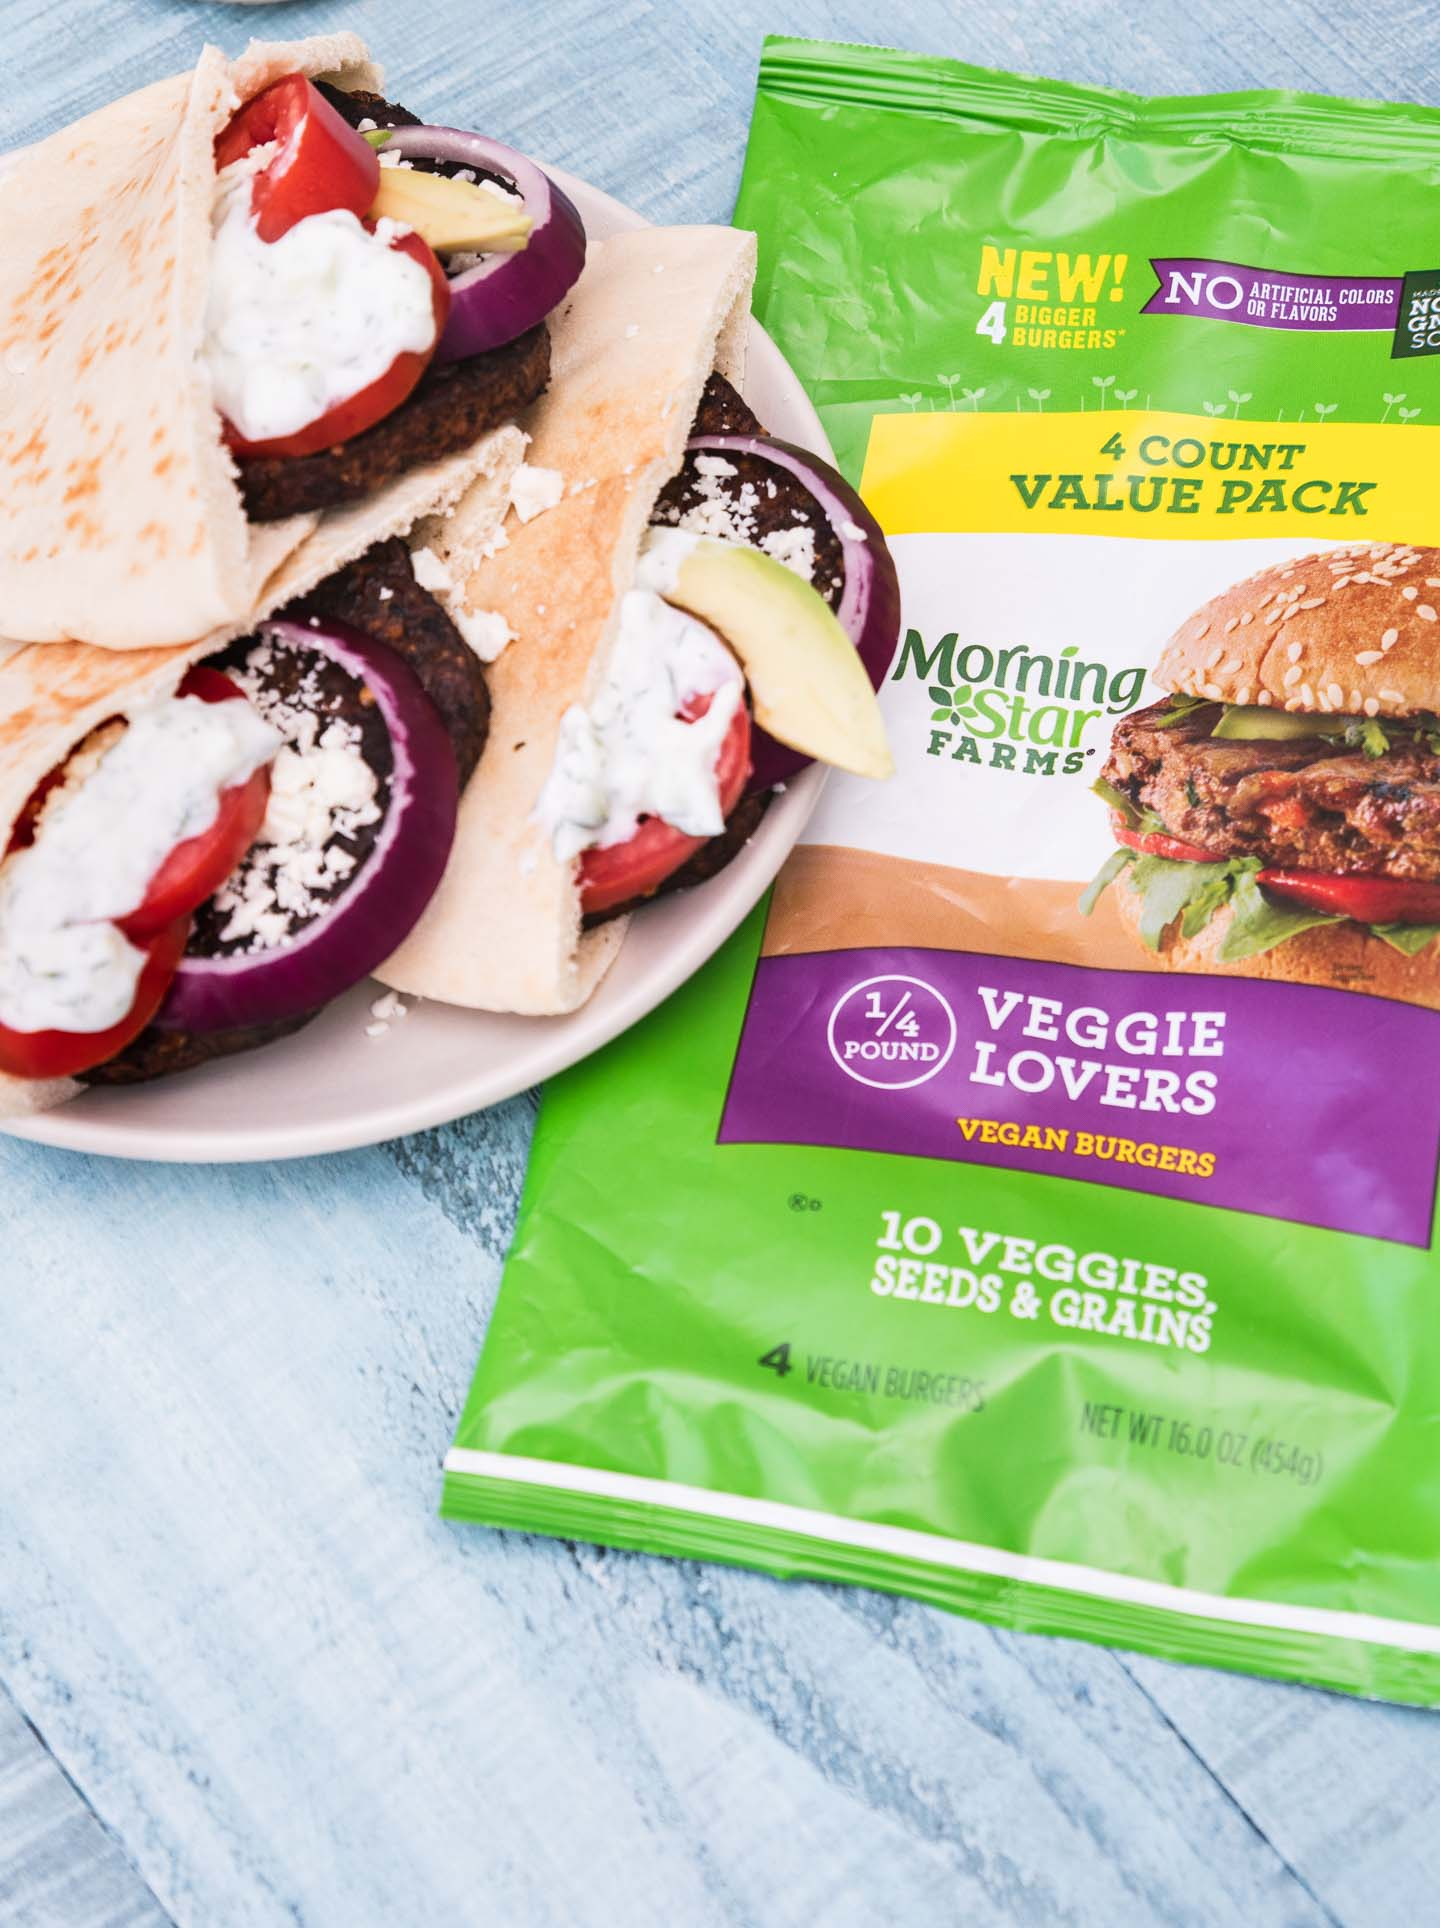 Greek-inspired veggie burgers with Morningstar Farms packaging